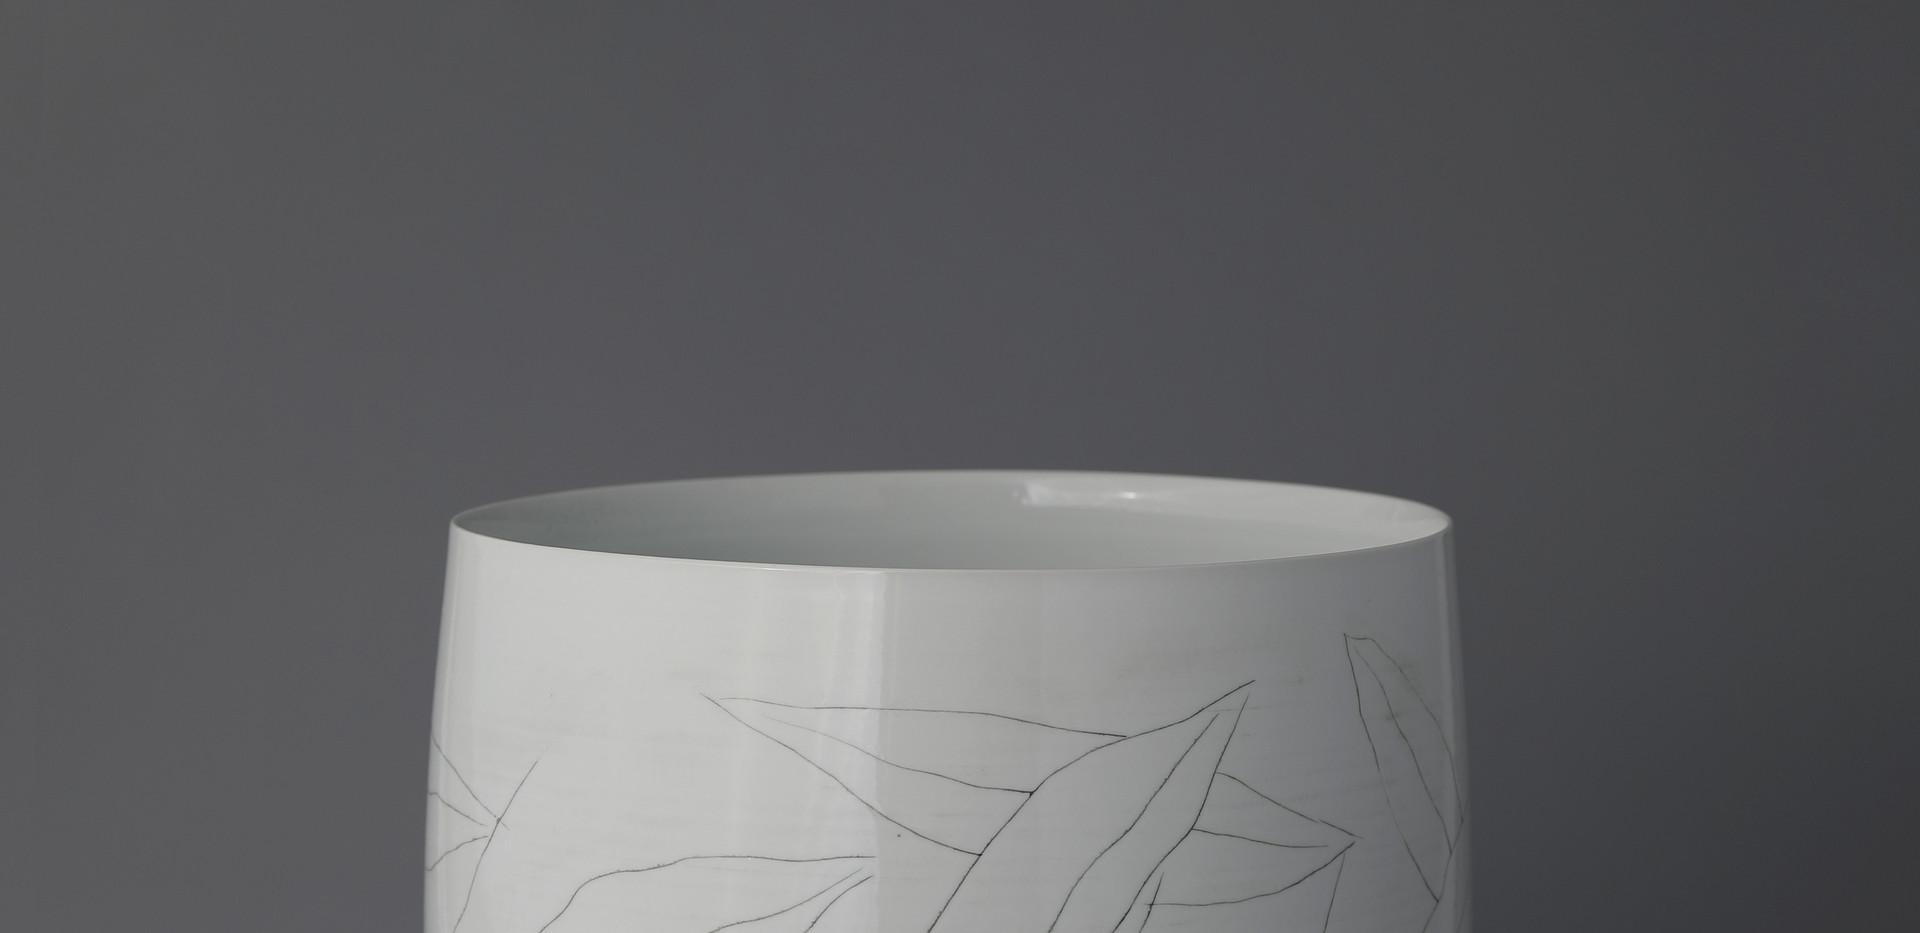 Large White Porcelain Vase with Inlaid Leaves Decoration, 2020